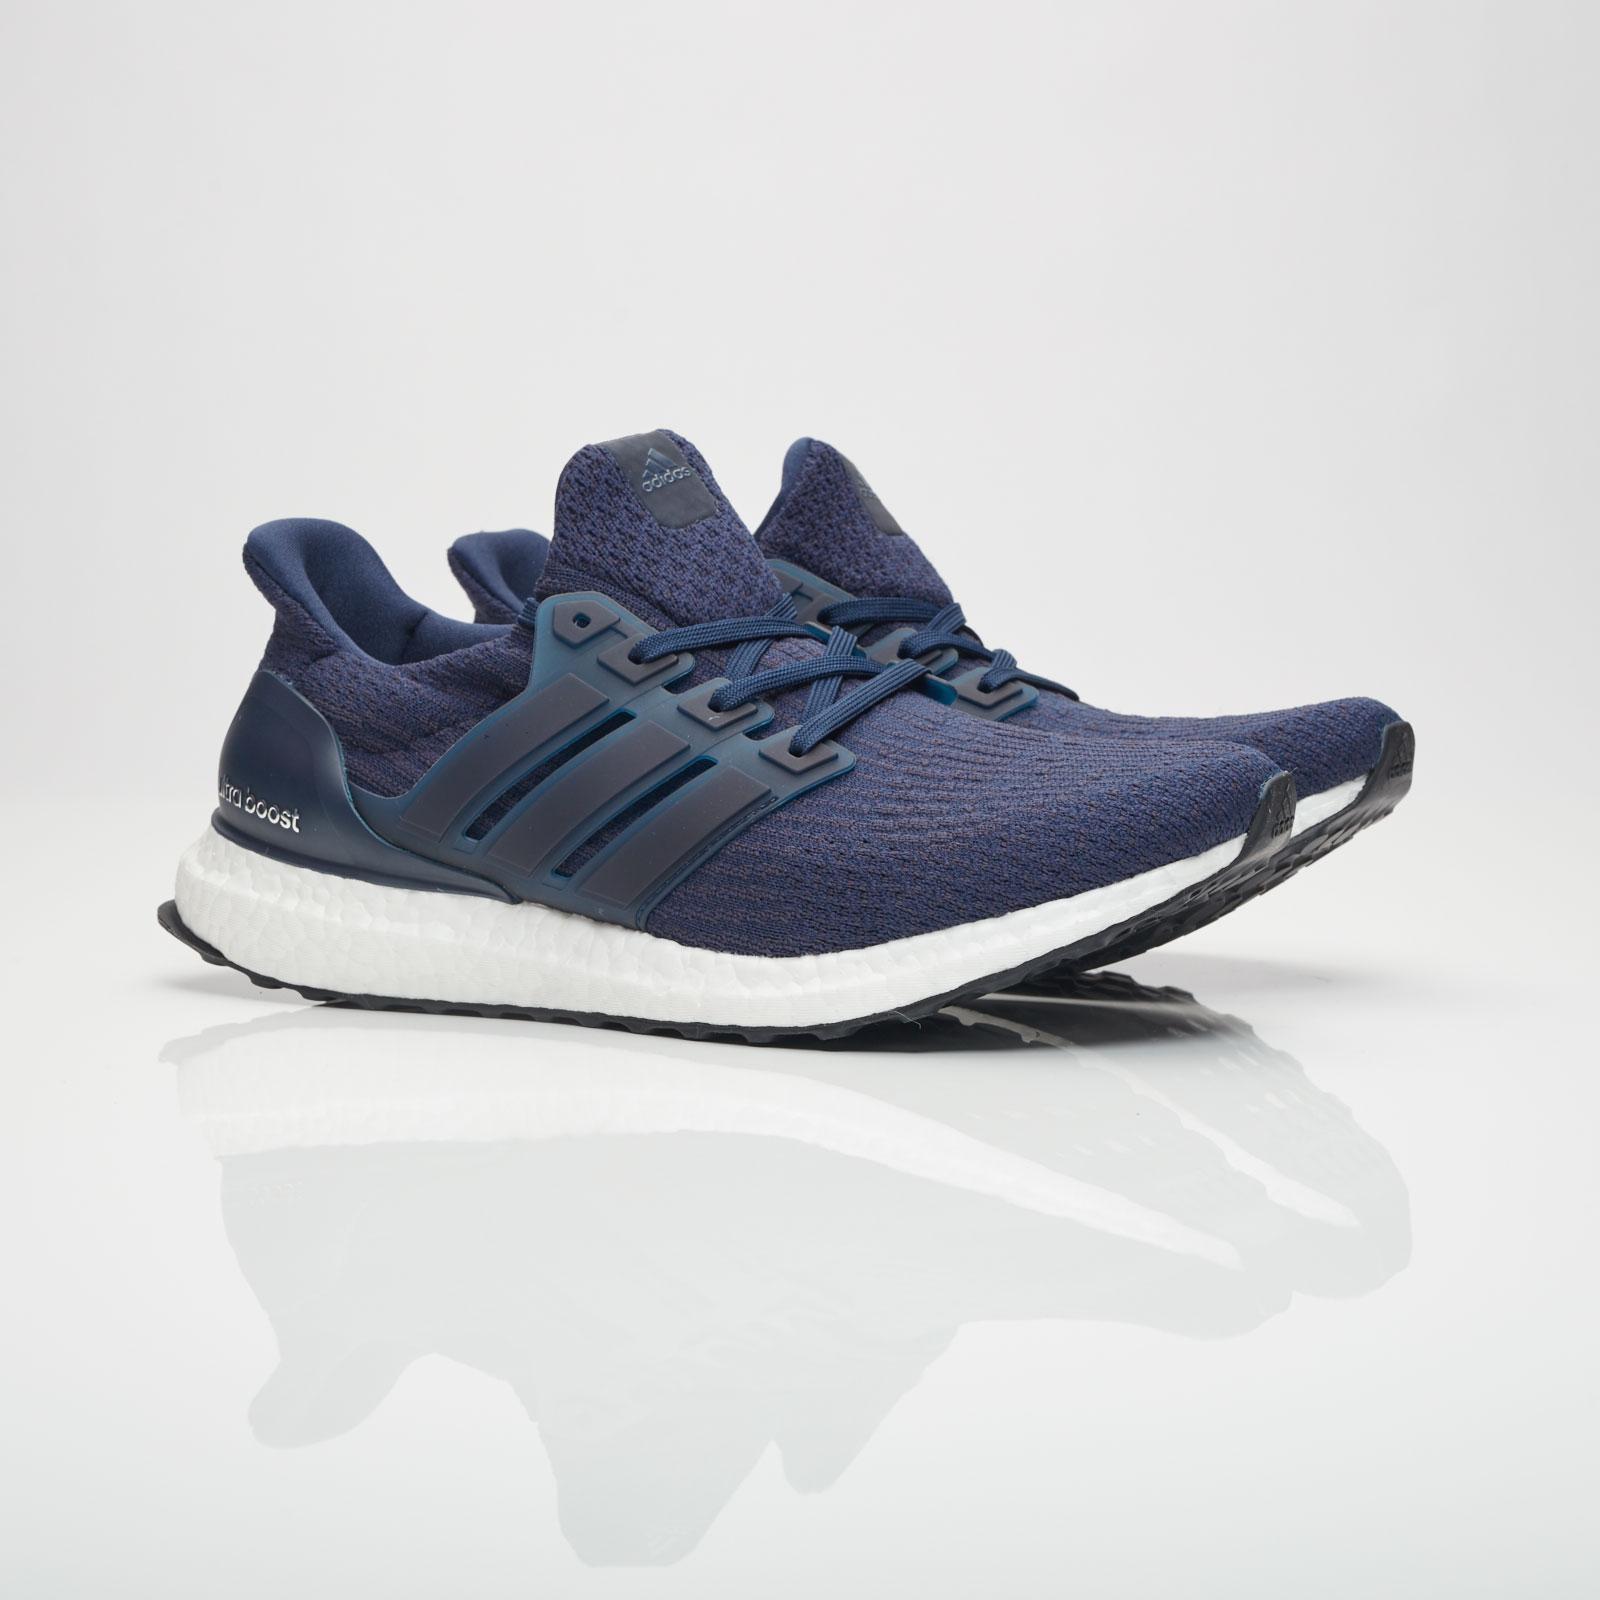 Adidas ginnasticanstuff ultraboost ba8843 scarpe da ginnasticanstuff Adidas scarpe & streetwear 182e81